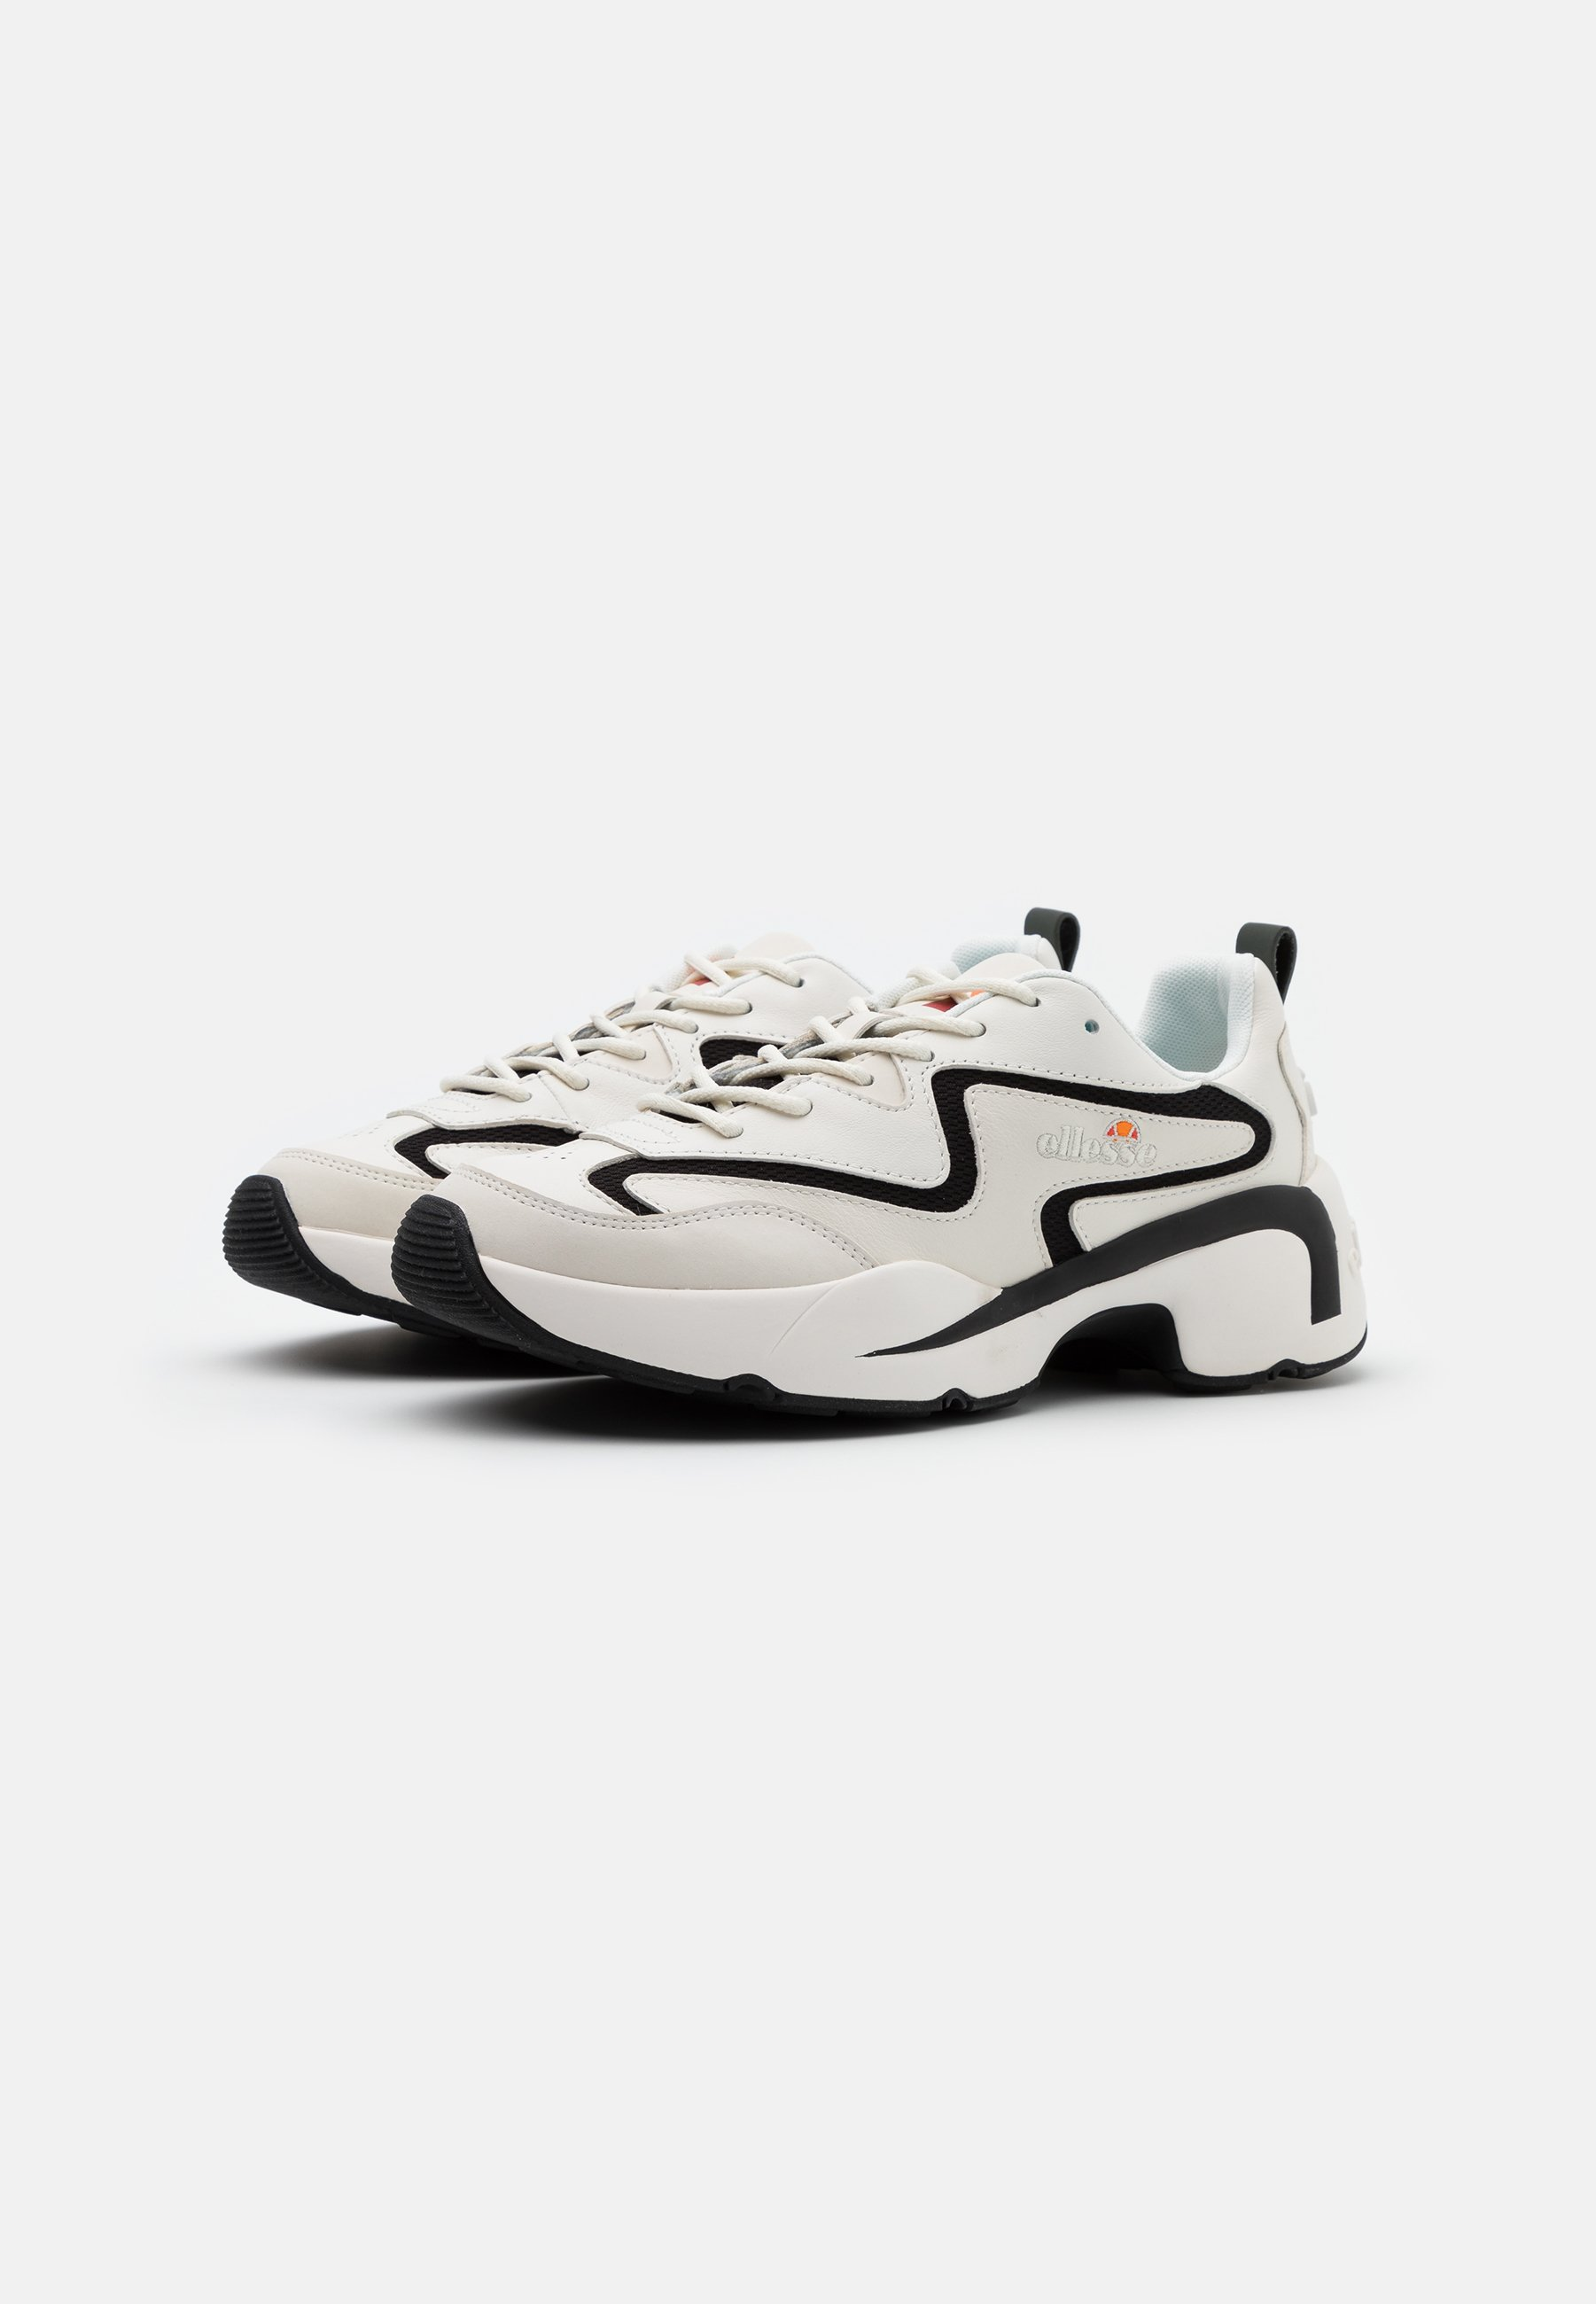 INDUS Sneakers whiteblack